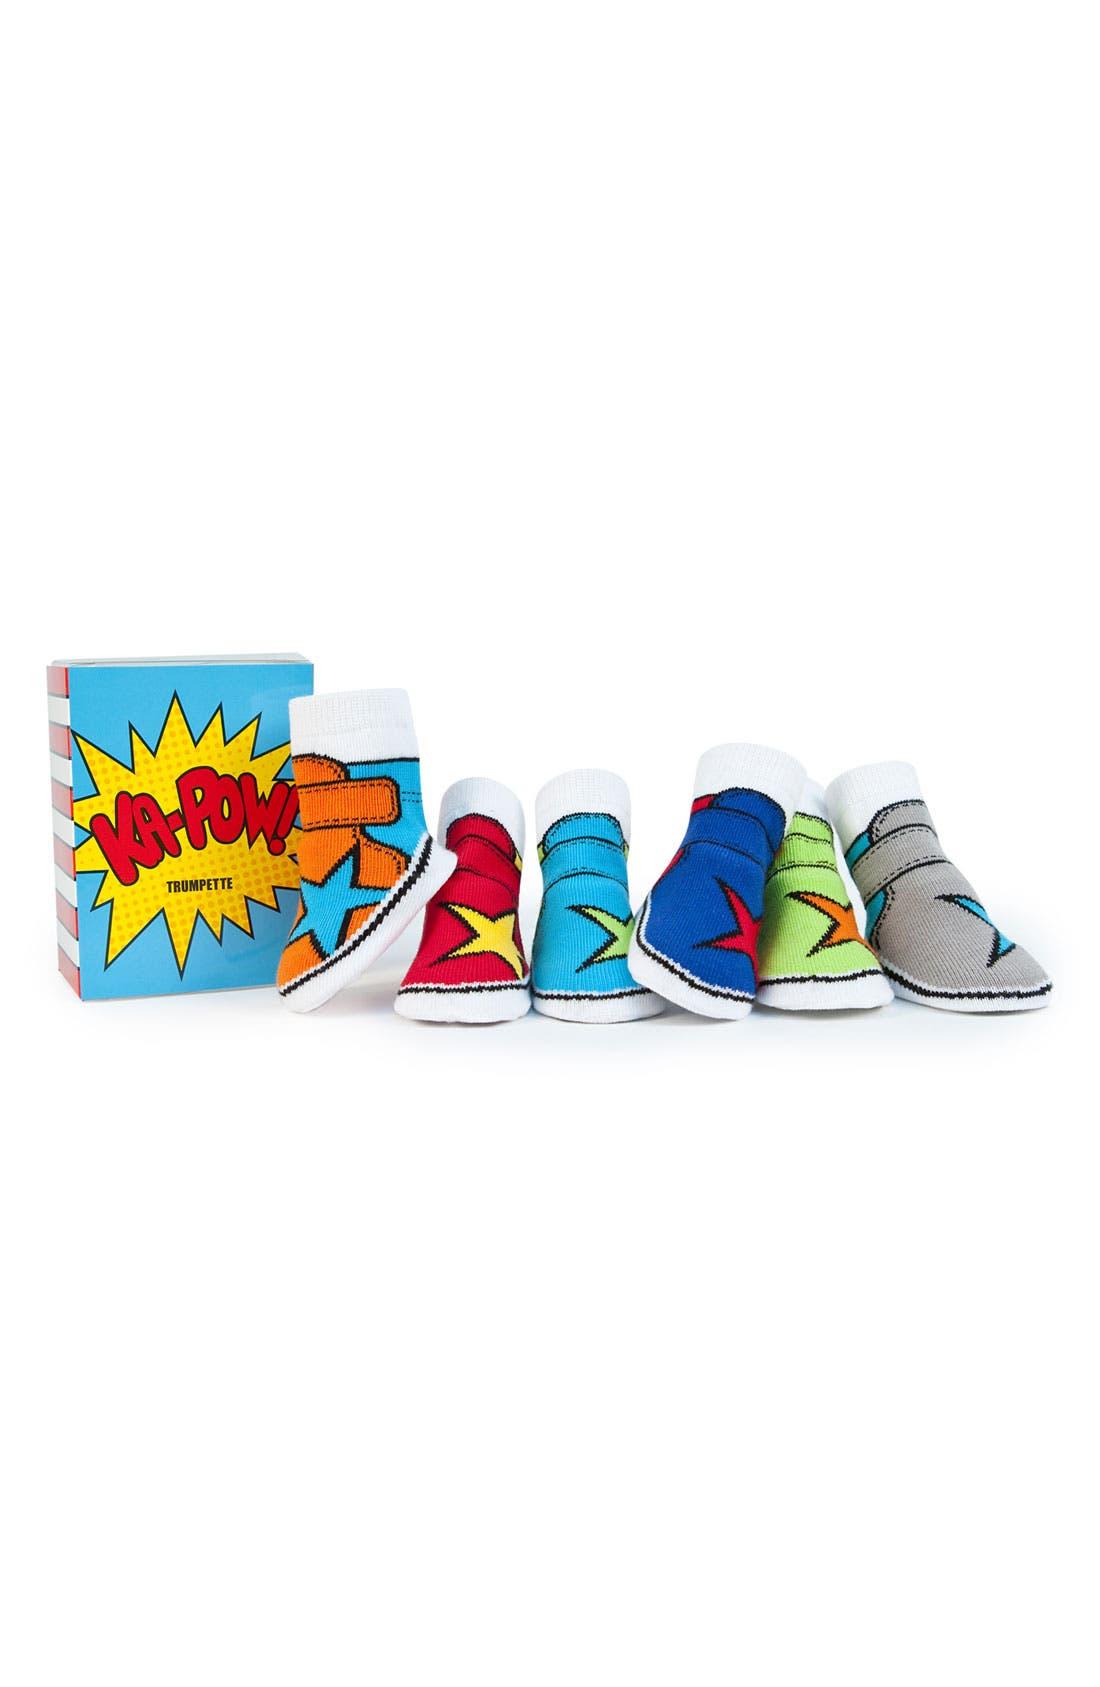 Main Image - Trumpette 'Ka Pow' Socks Gift Set (Baby Boys)